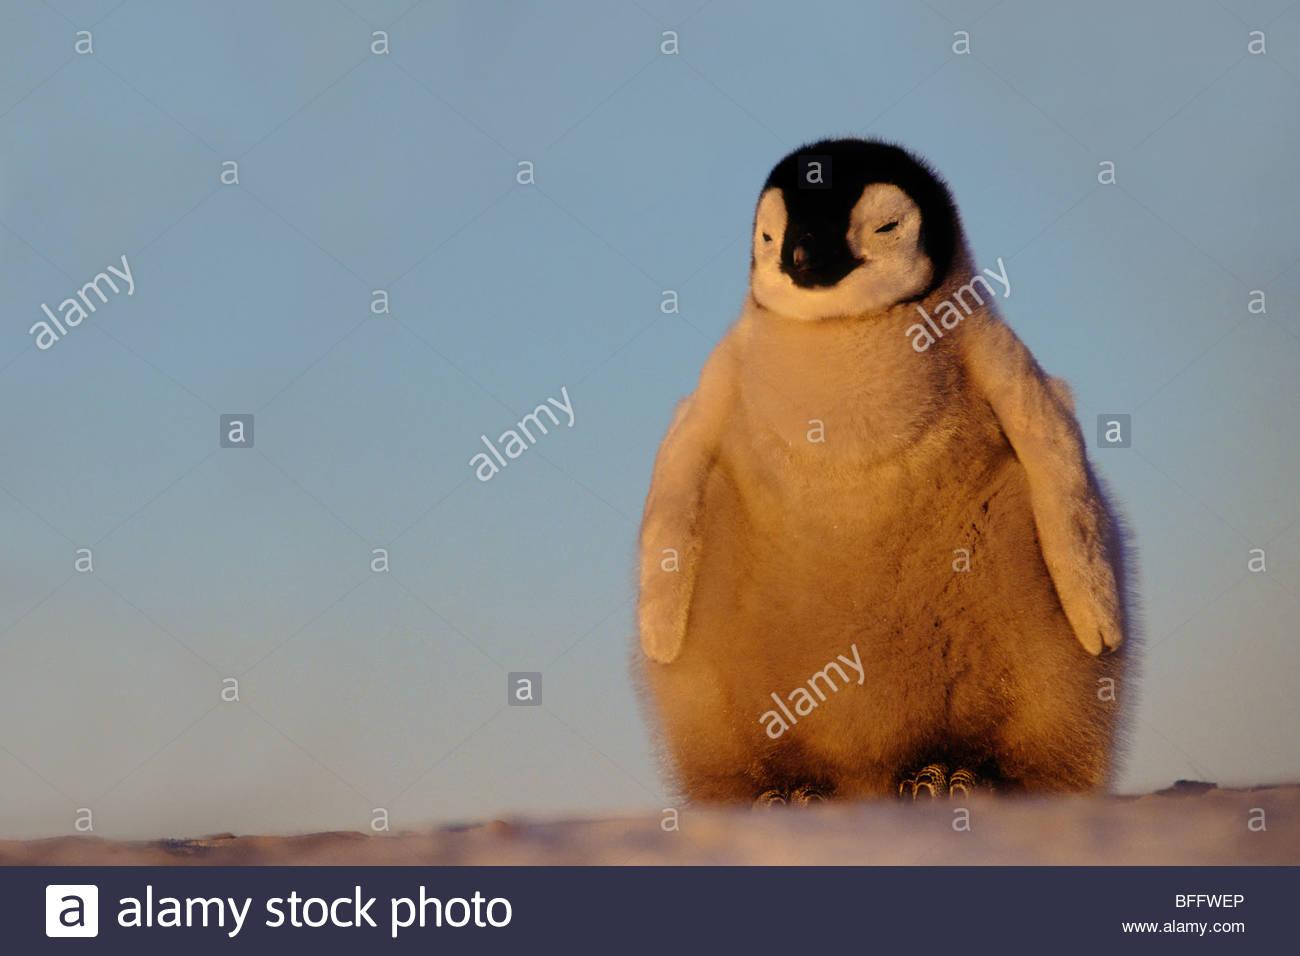 Emperor penguin chick, Aptenodytes forsteri, Antarctica - Stock Image